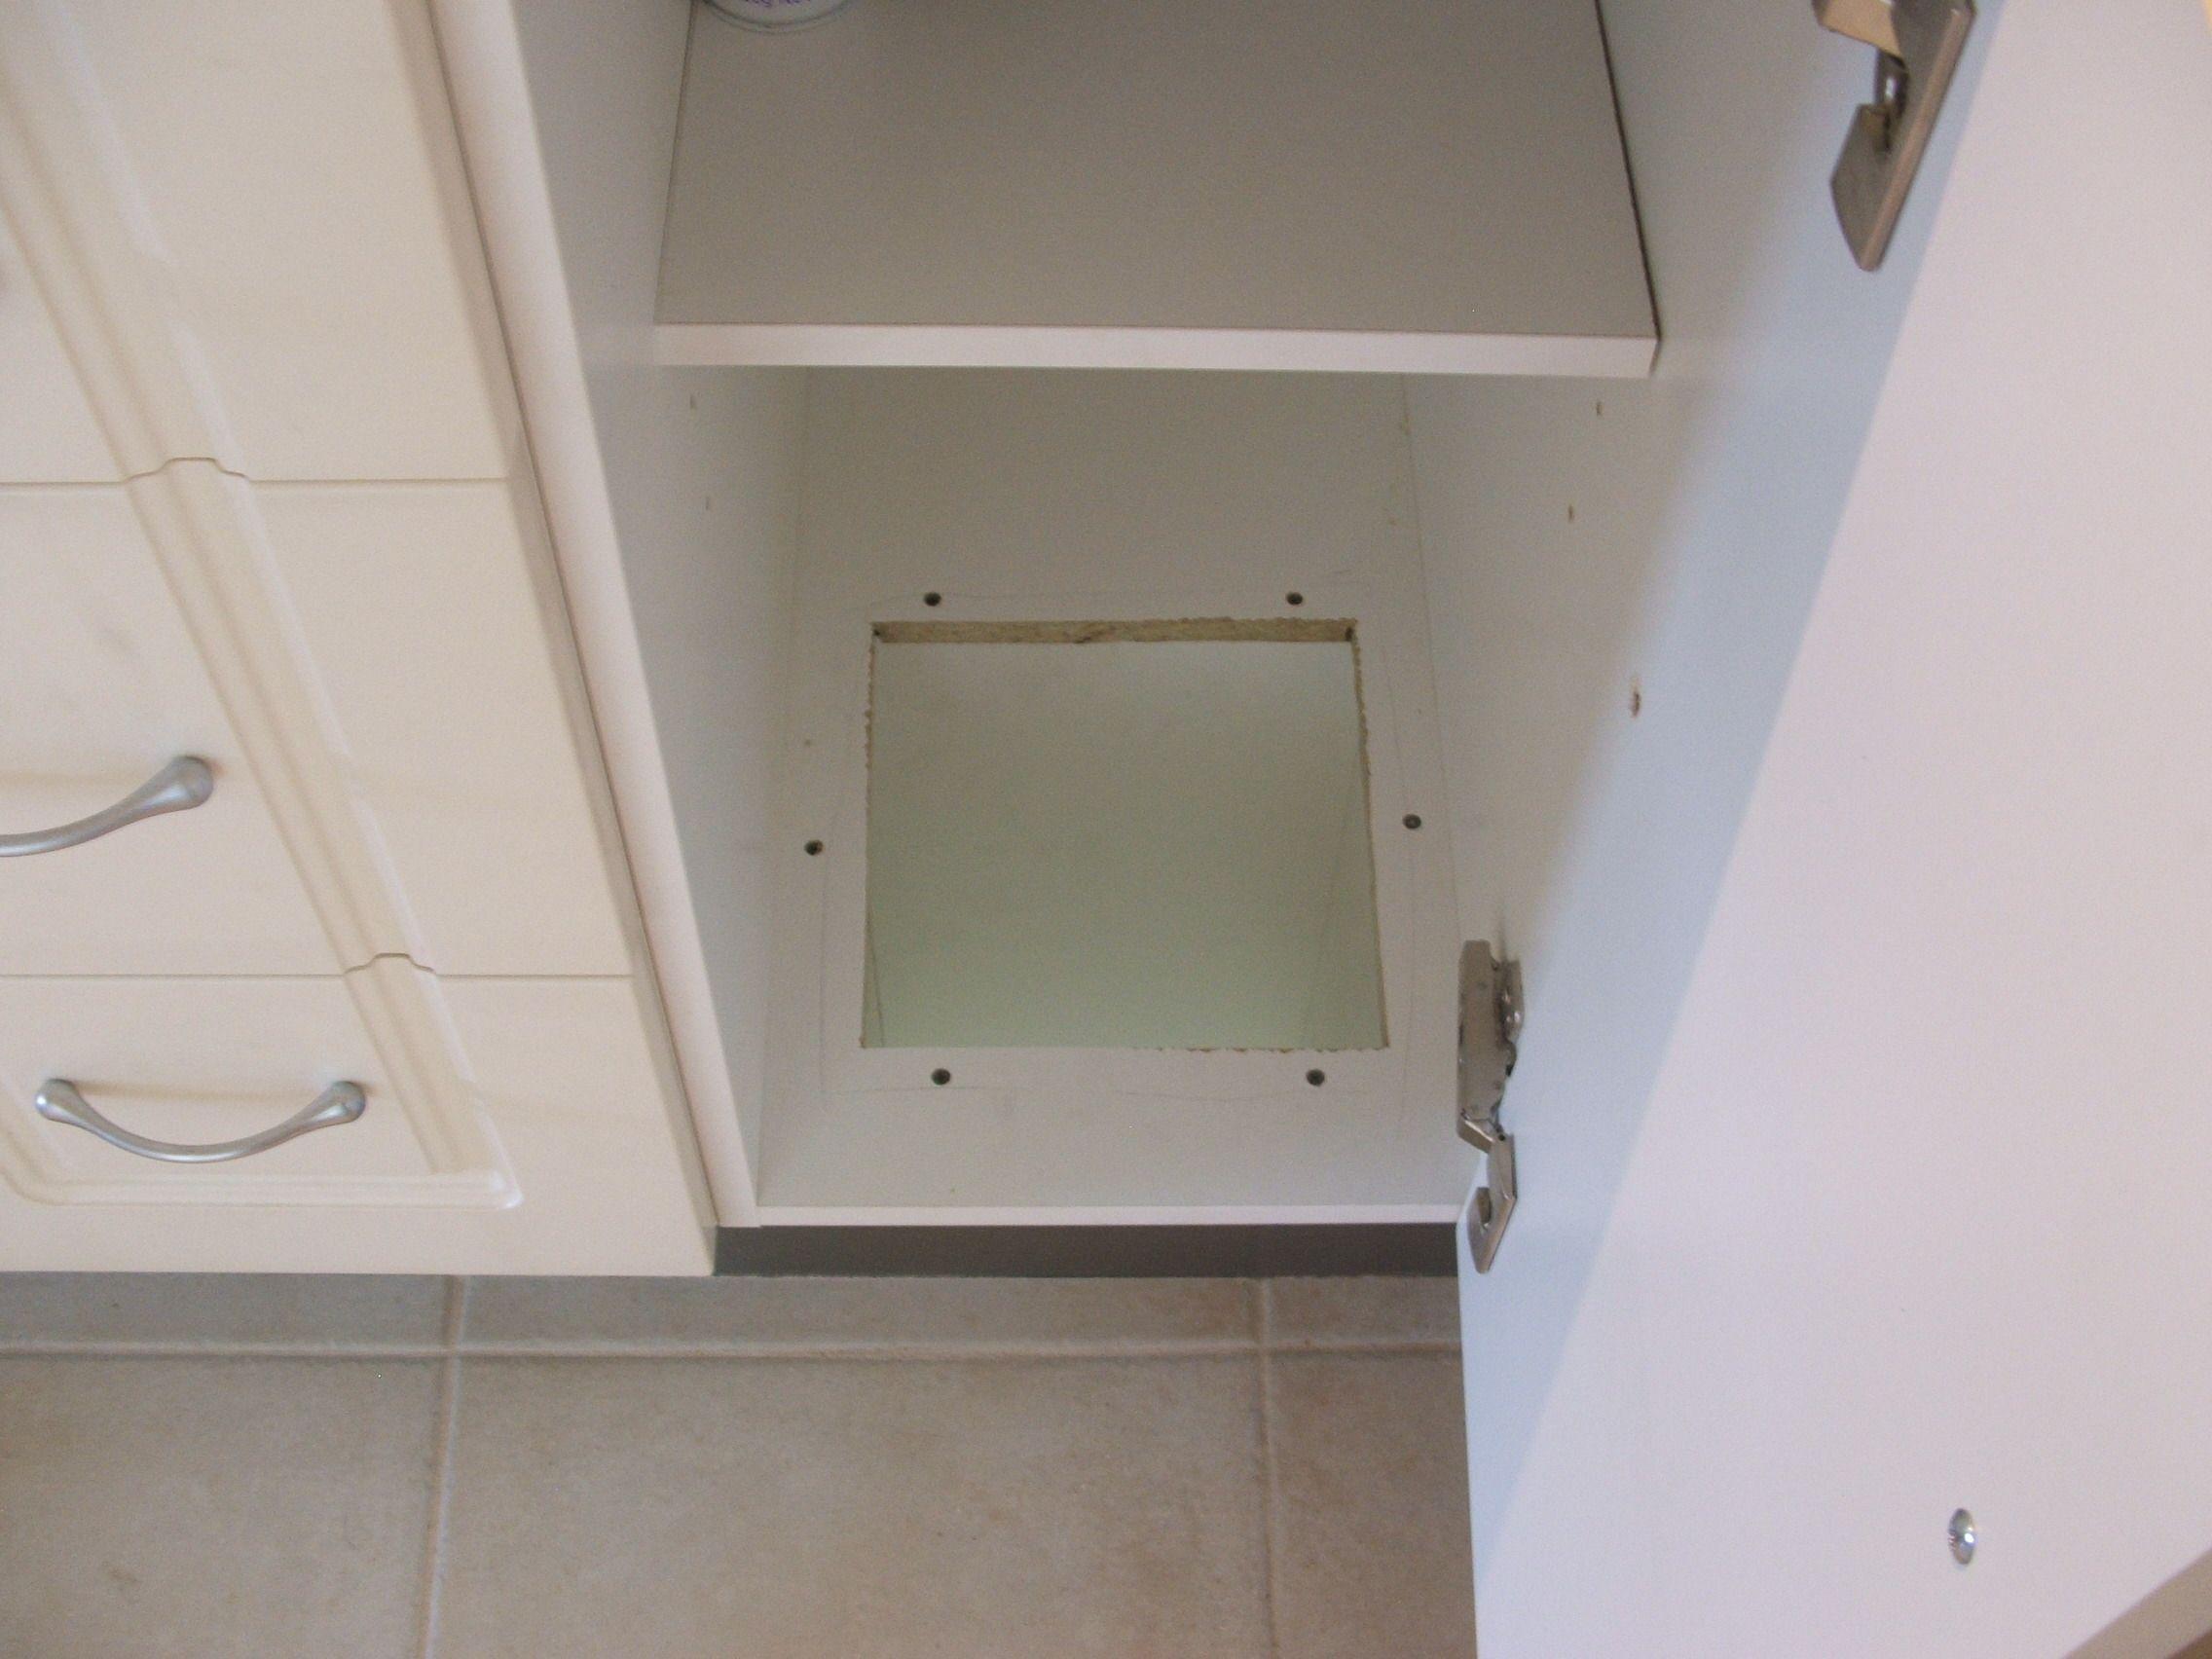 Laundry chute bathroom pinterest laundry chute for Laundry chute design